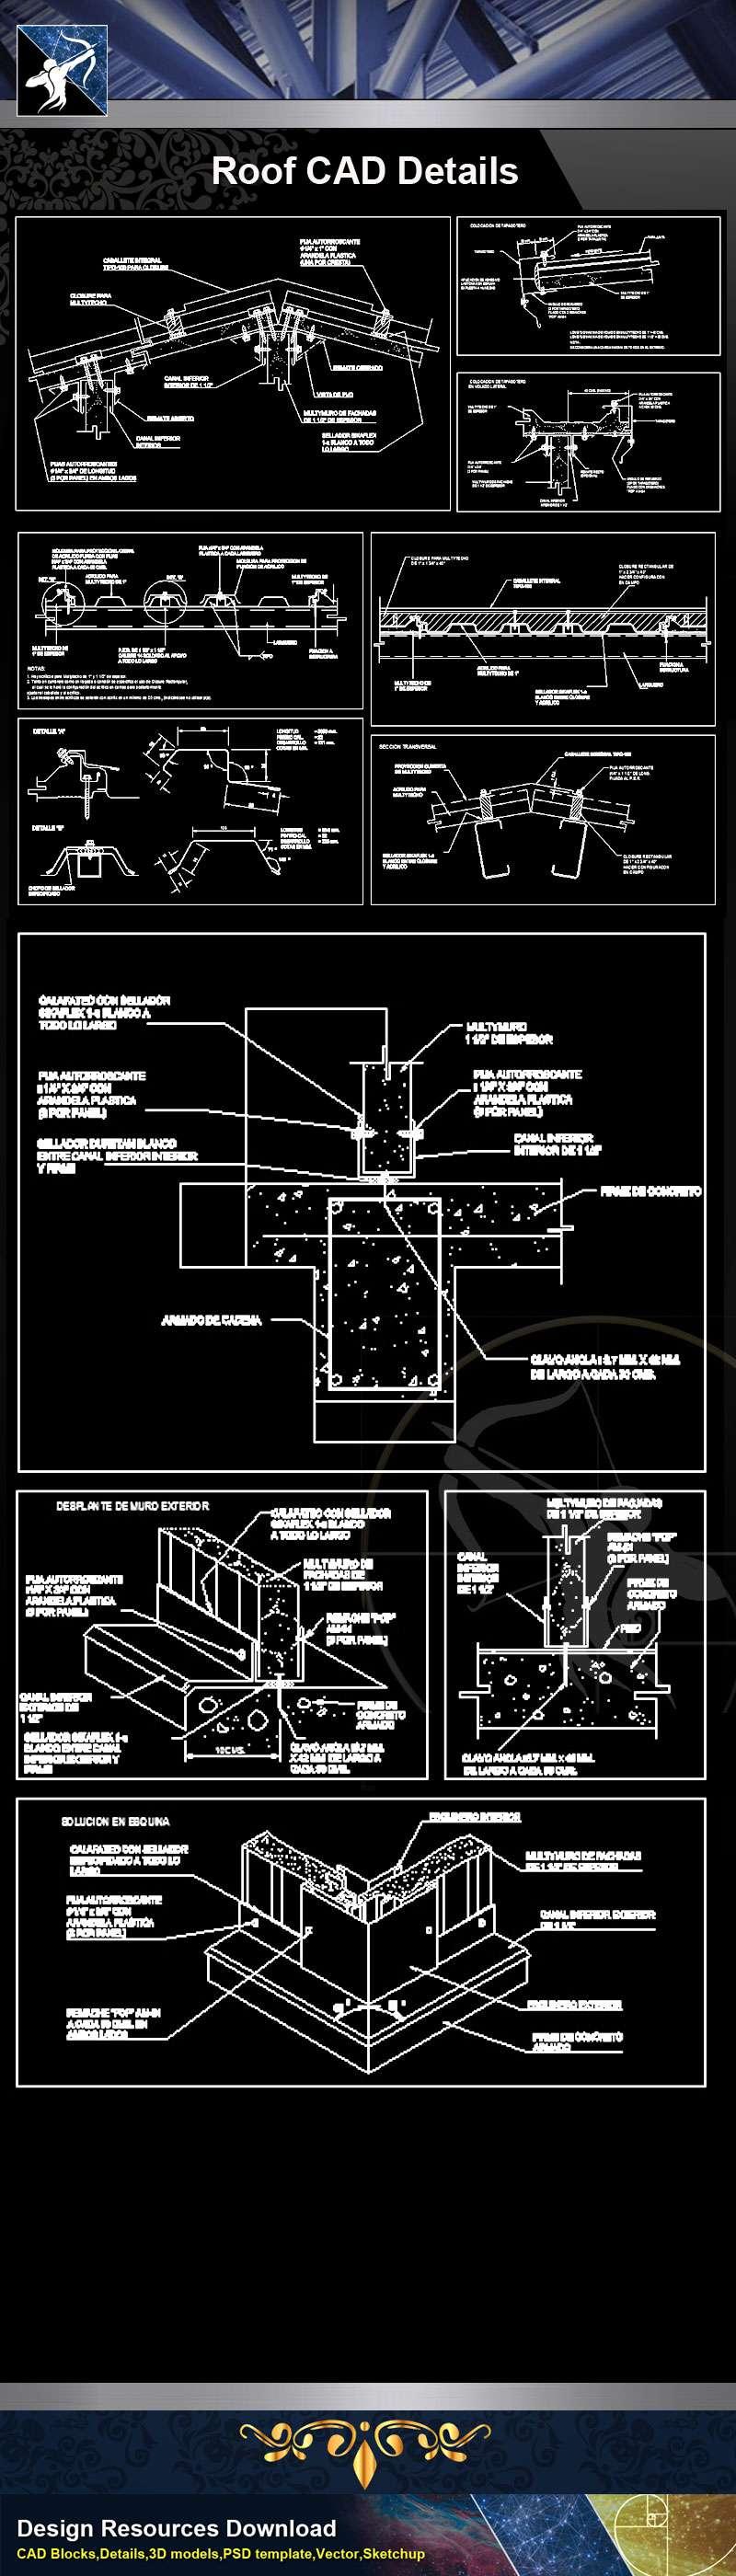 【Architecture CAD Details Collections】Roof CAD Details V.1